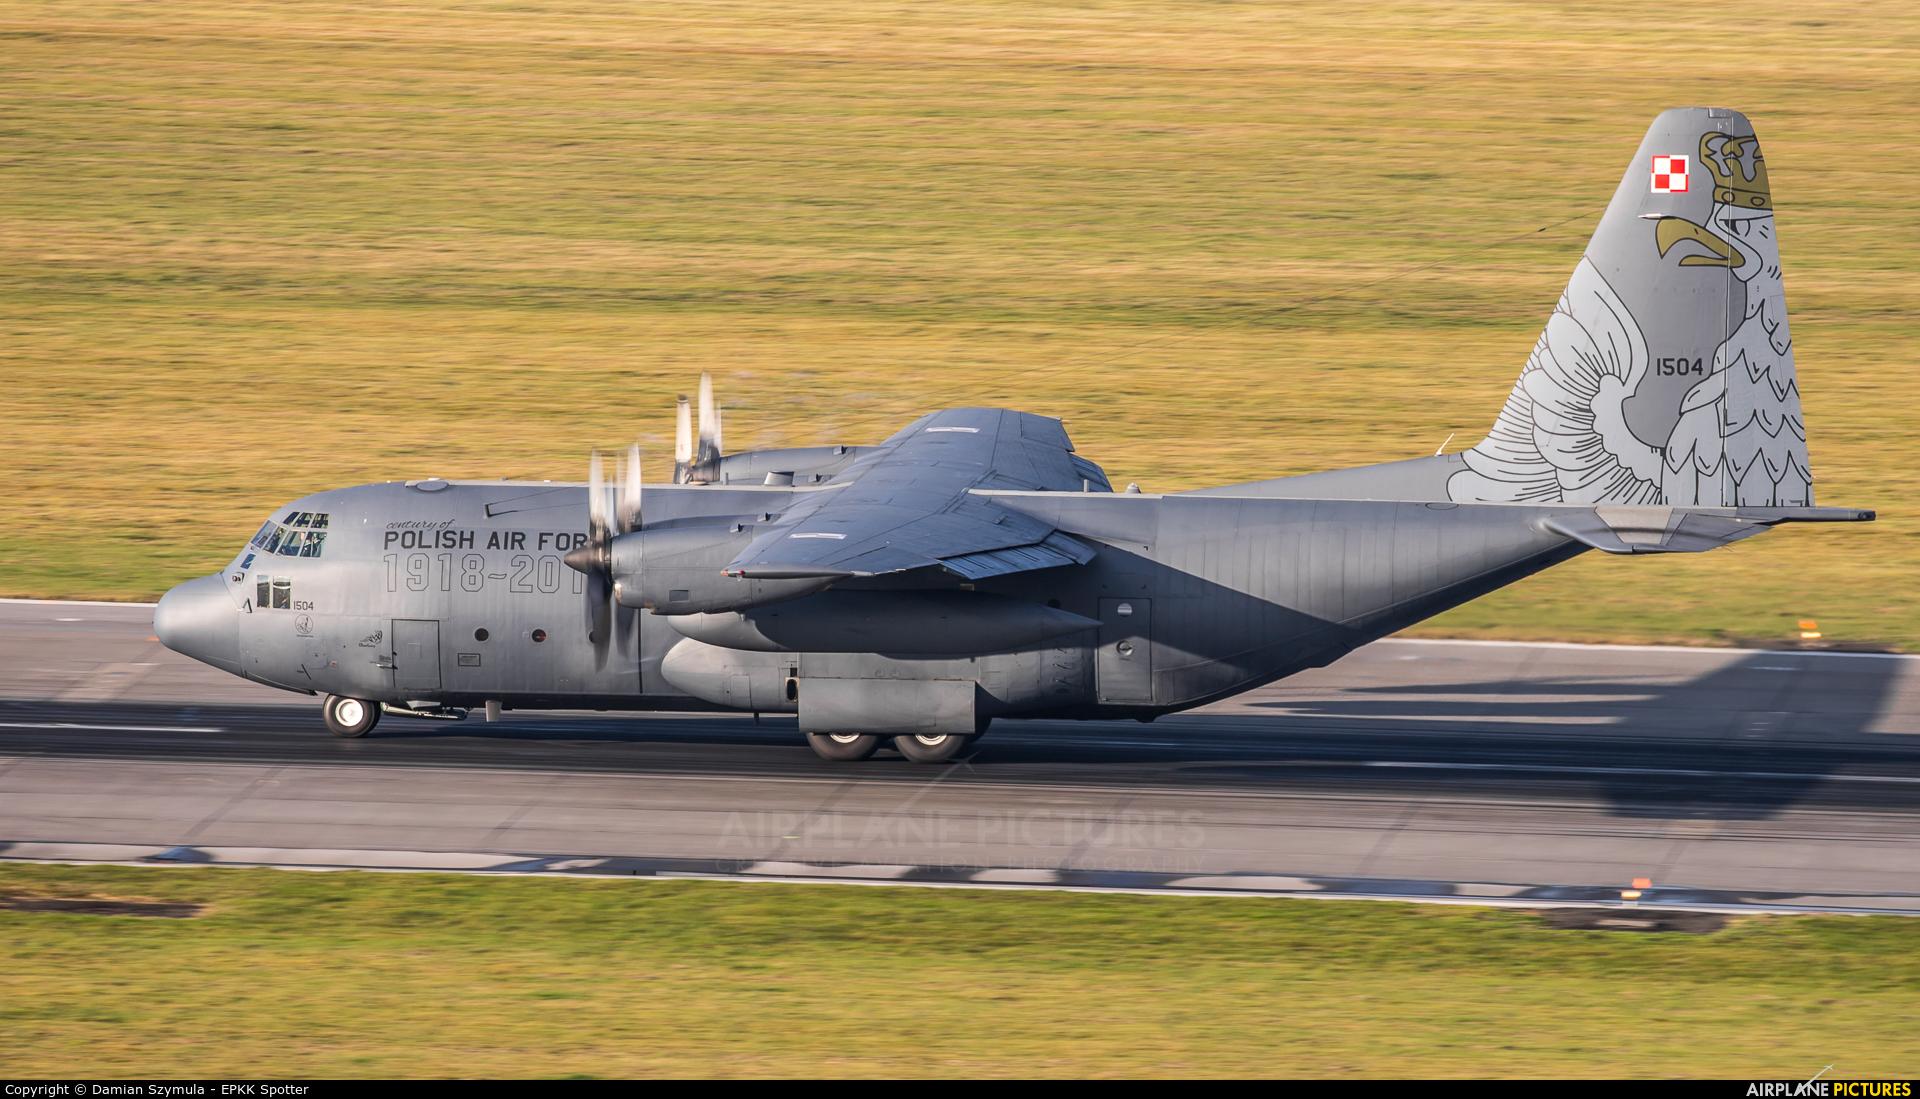 Poland - Air Force 1504 aircraft at Kraków - John Paul II Intl